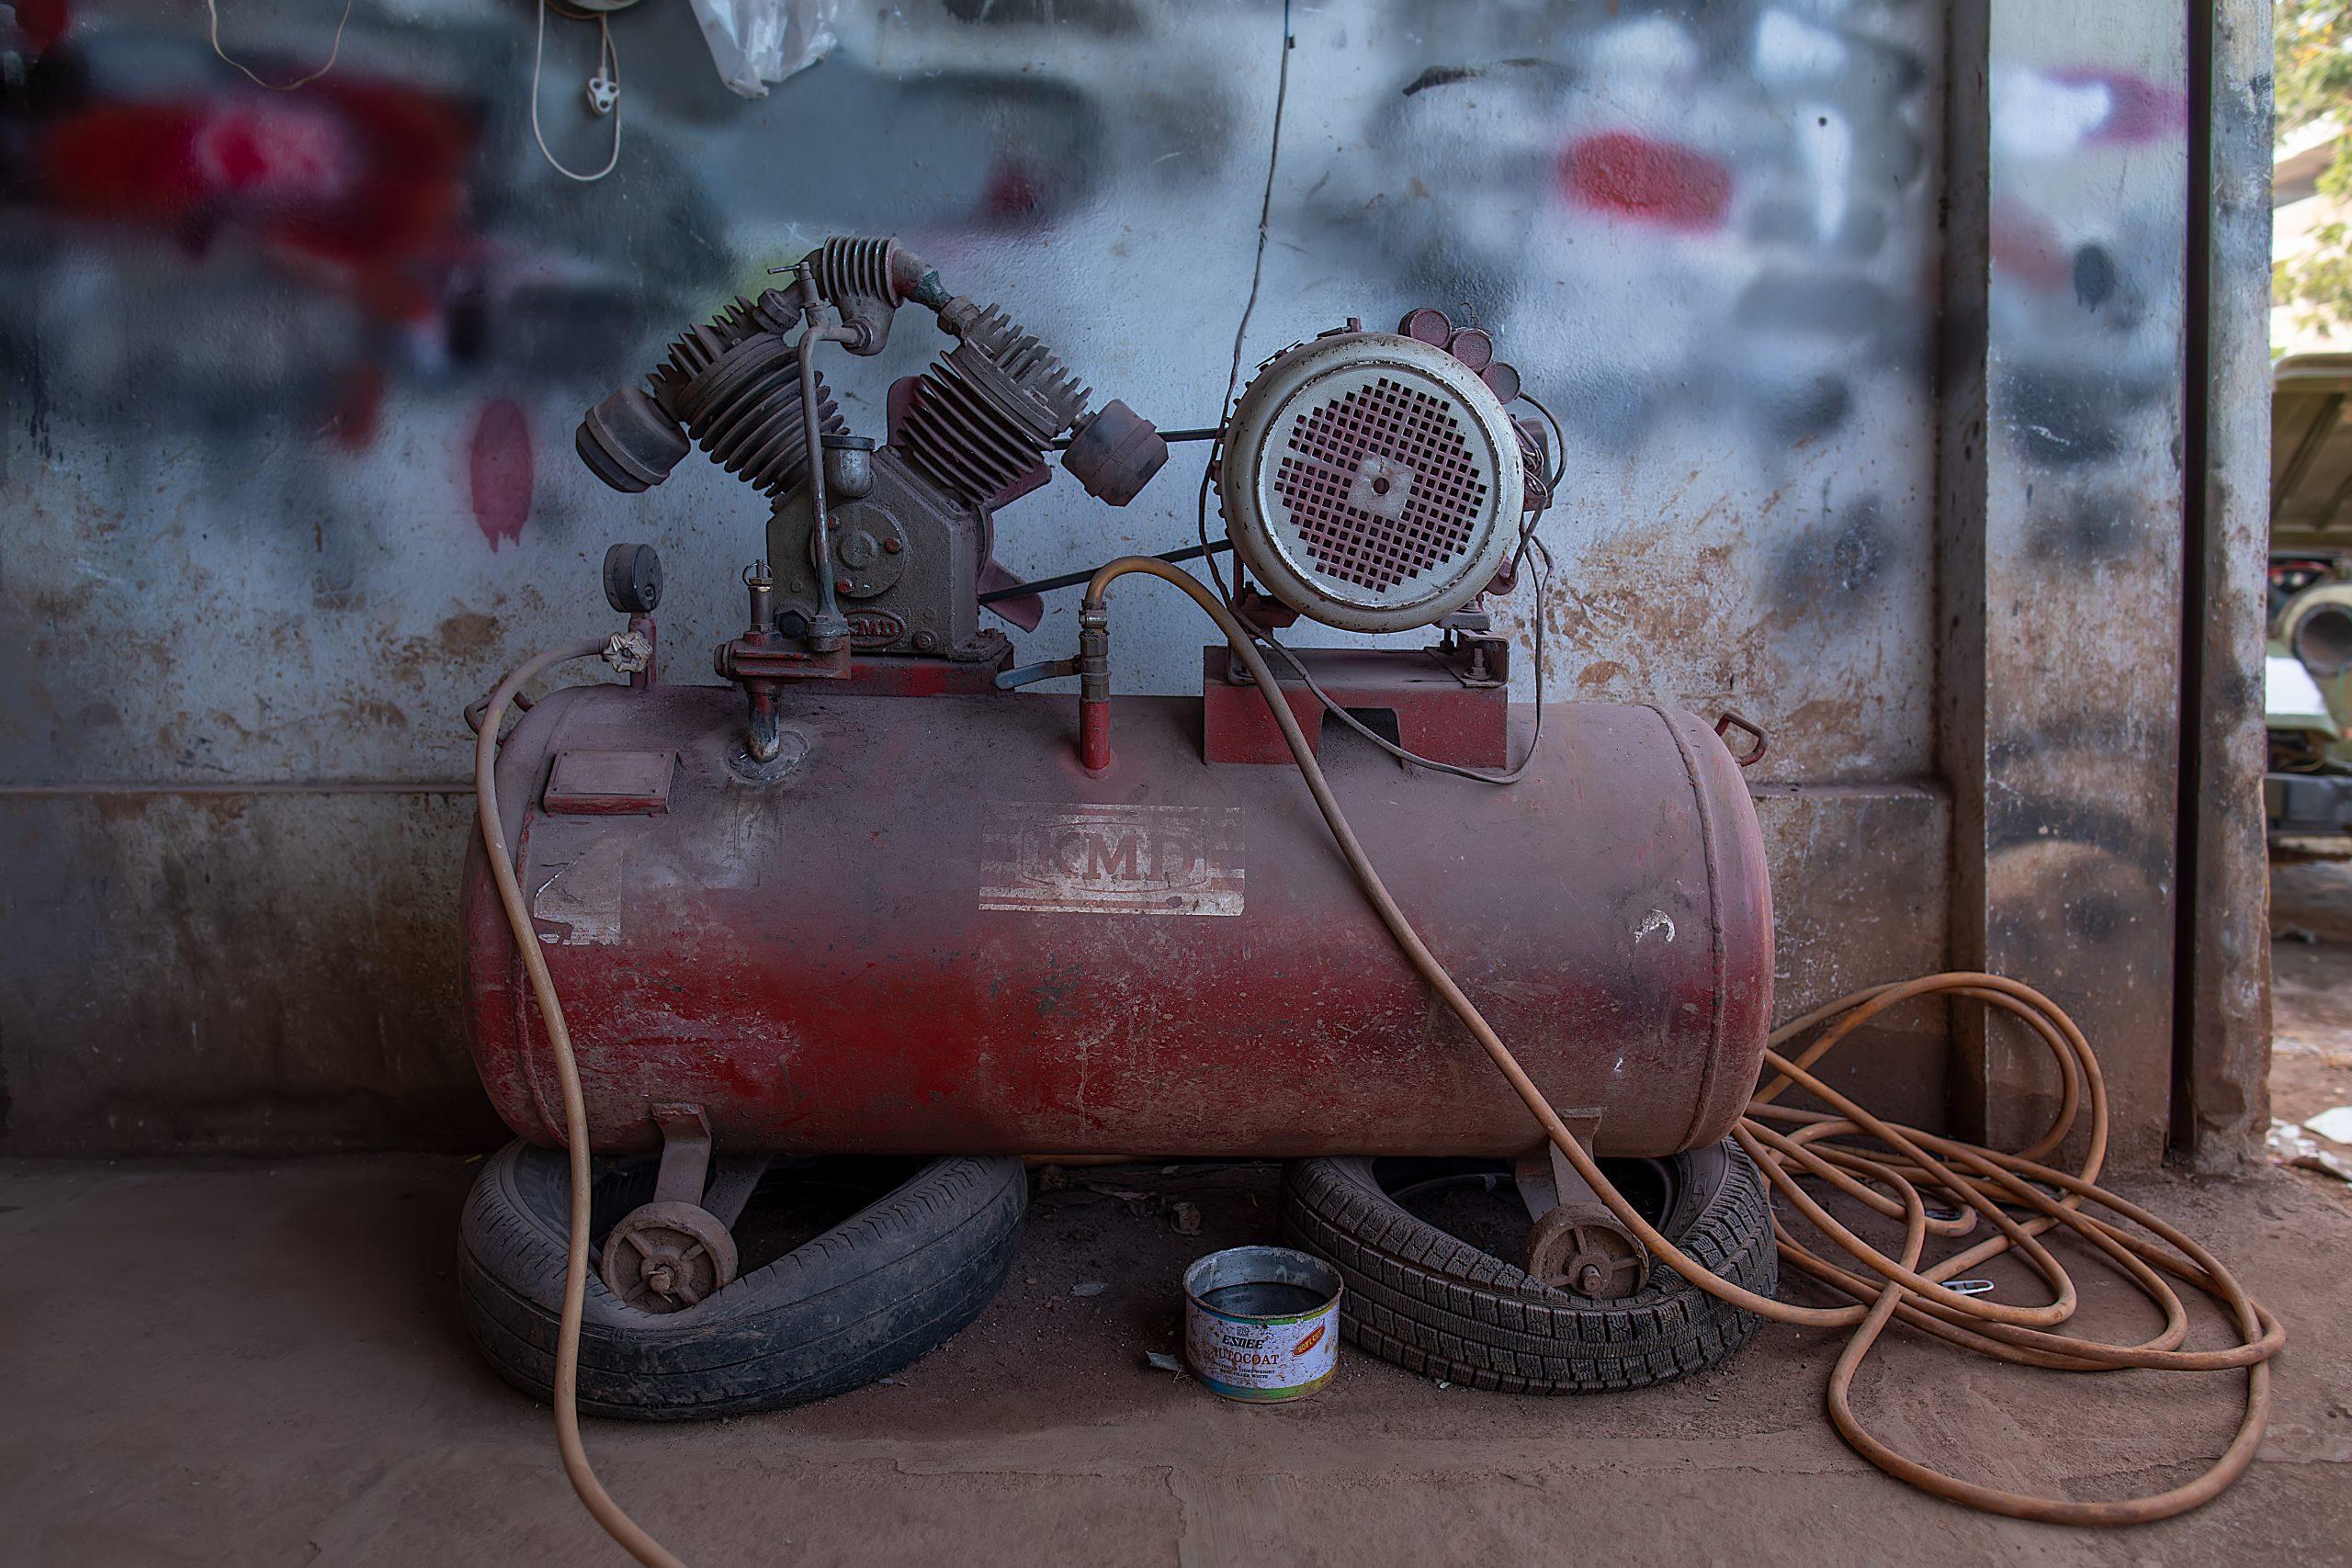 An air compressor machine